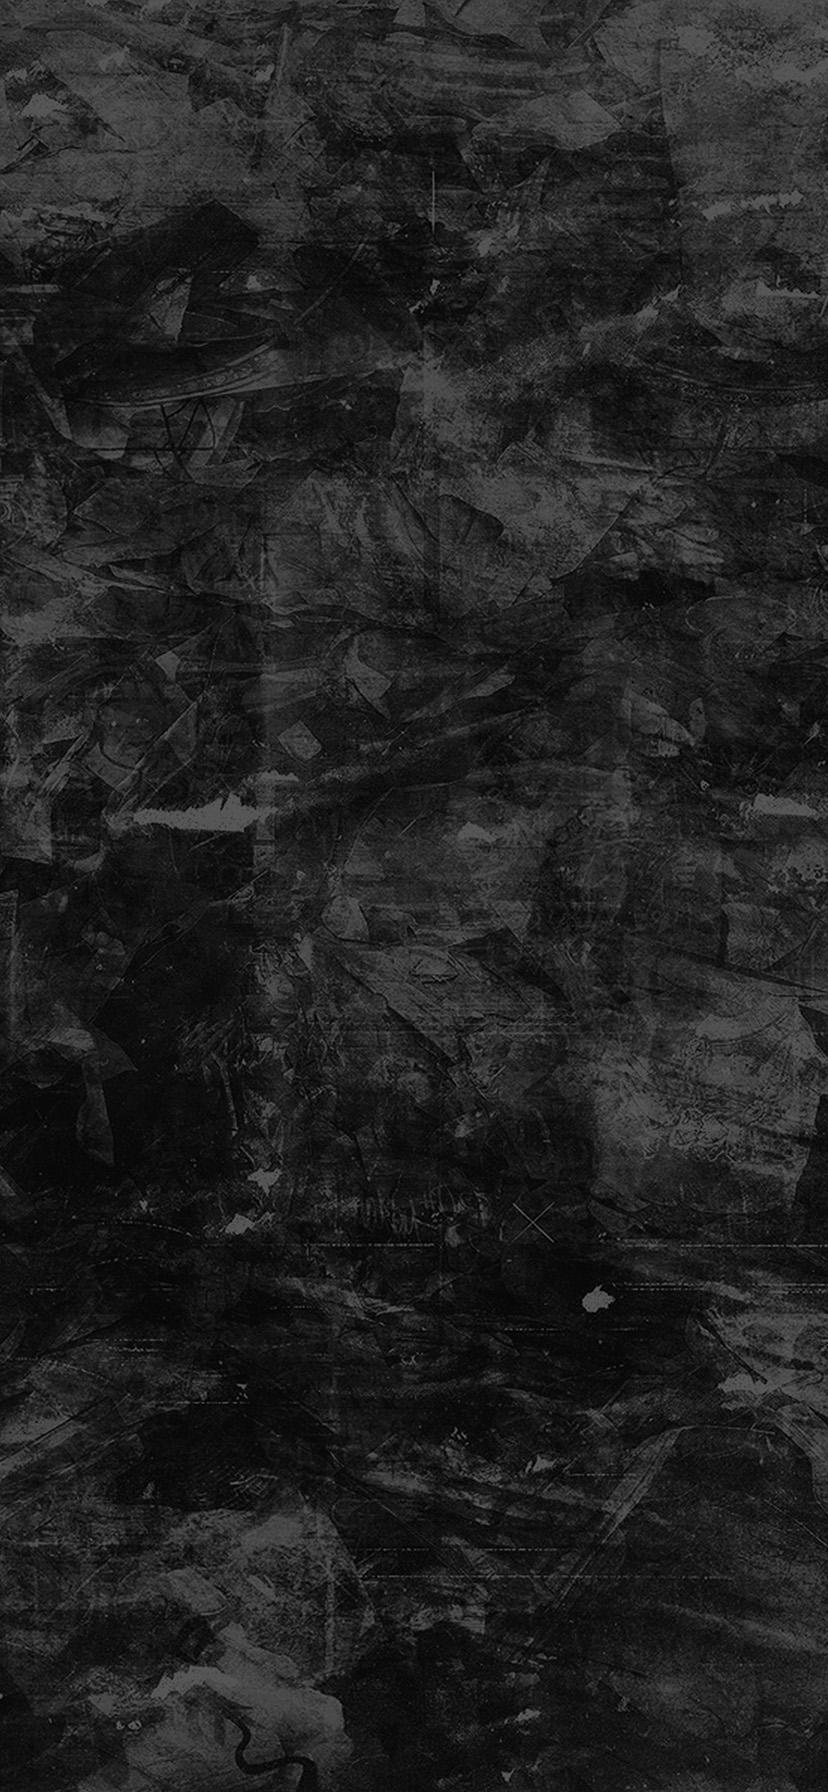 Black Iphone Xr Wallpapers Top Free Black Iphone Xr